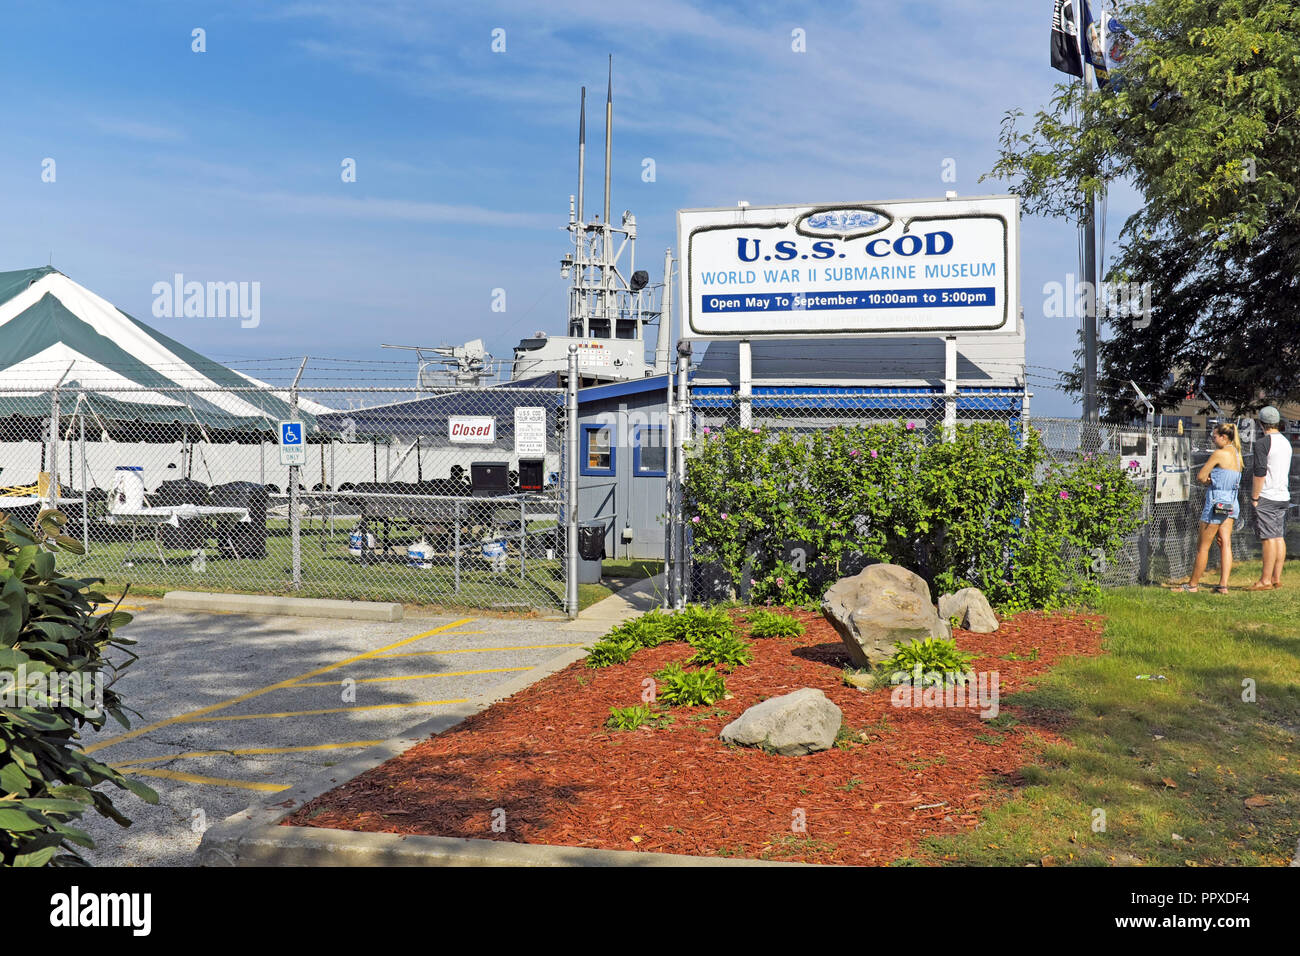 U.S.S. Cod World War II Submarine Museum in the North Coast Harbor of Cleveland, Ohio, USA. - Stock Image